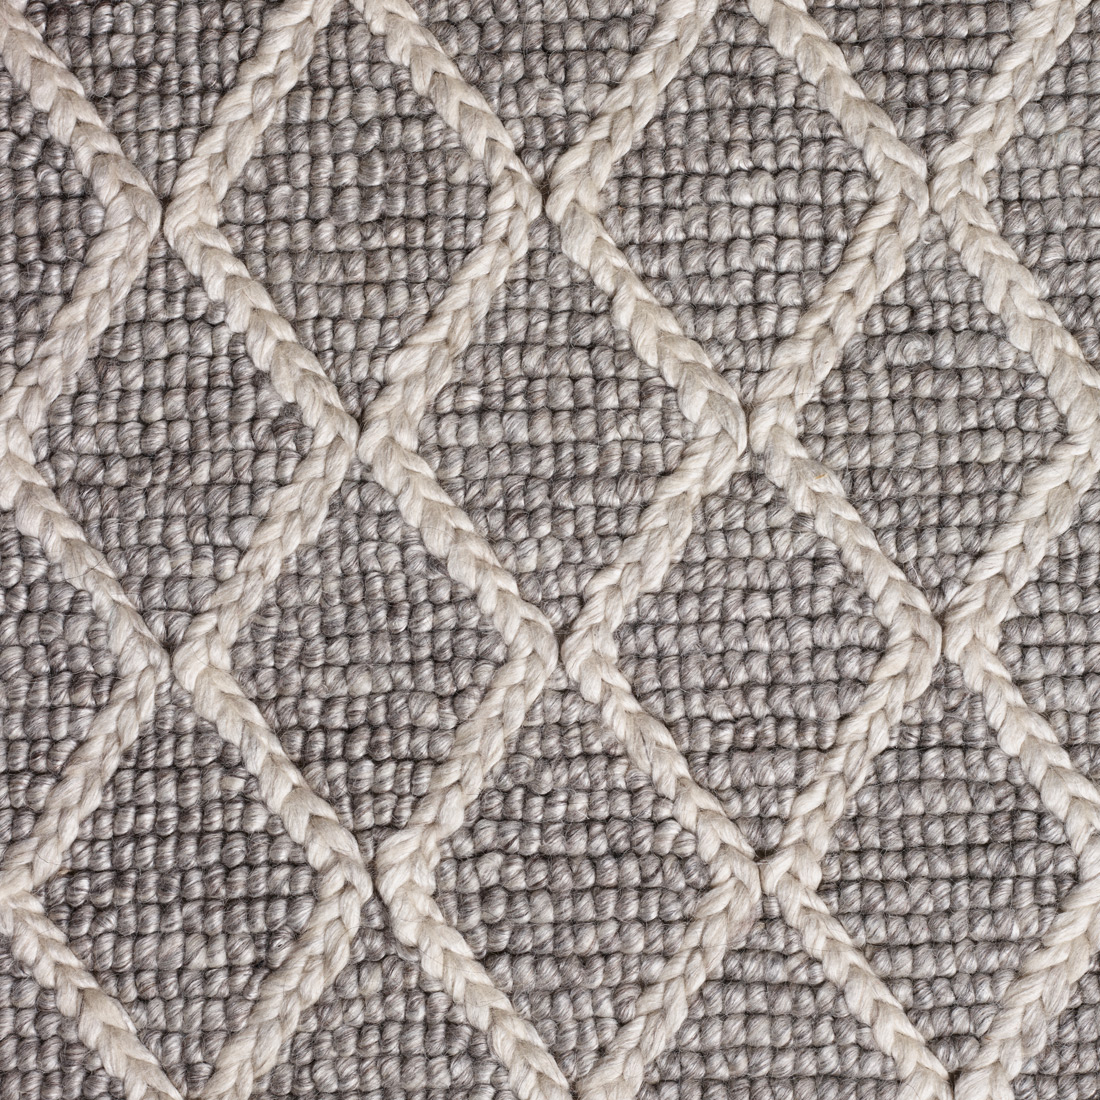 Vloerkleed Xilento Maestro Grey White | 200 x 300 cm